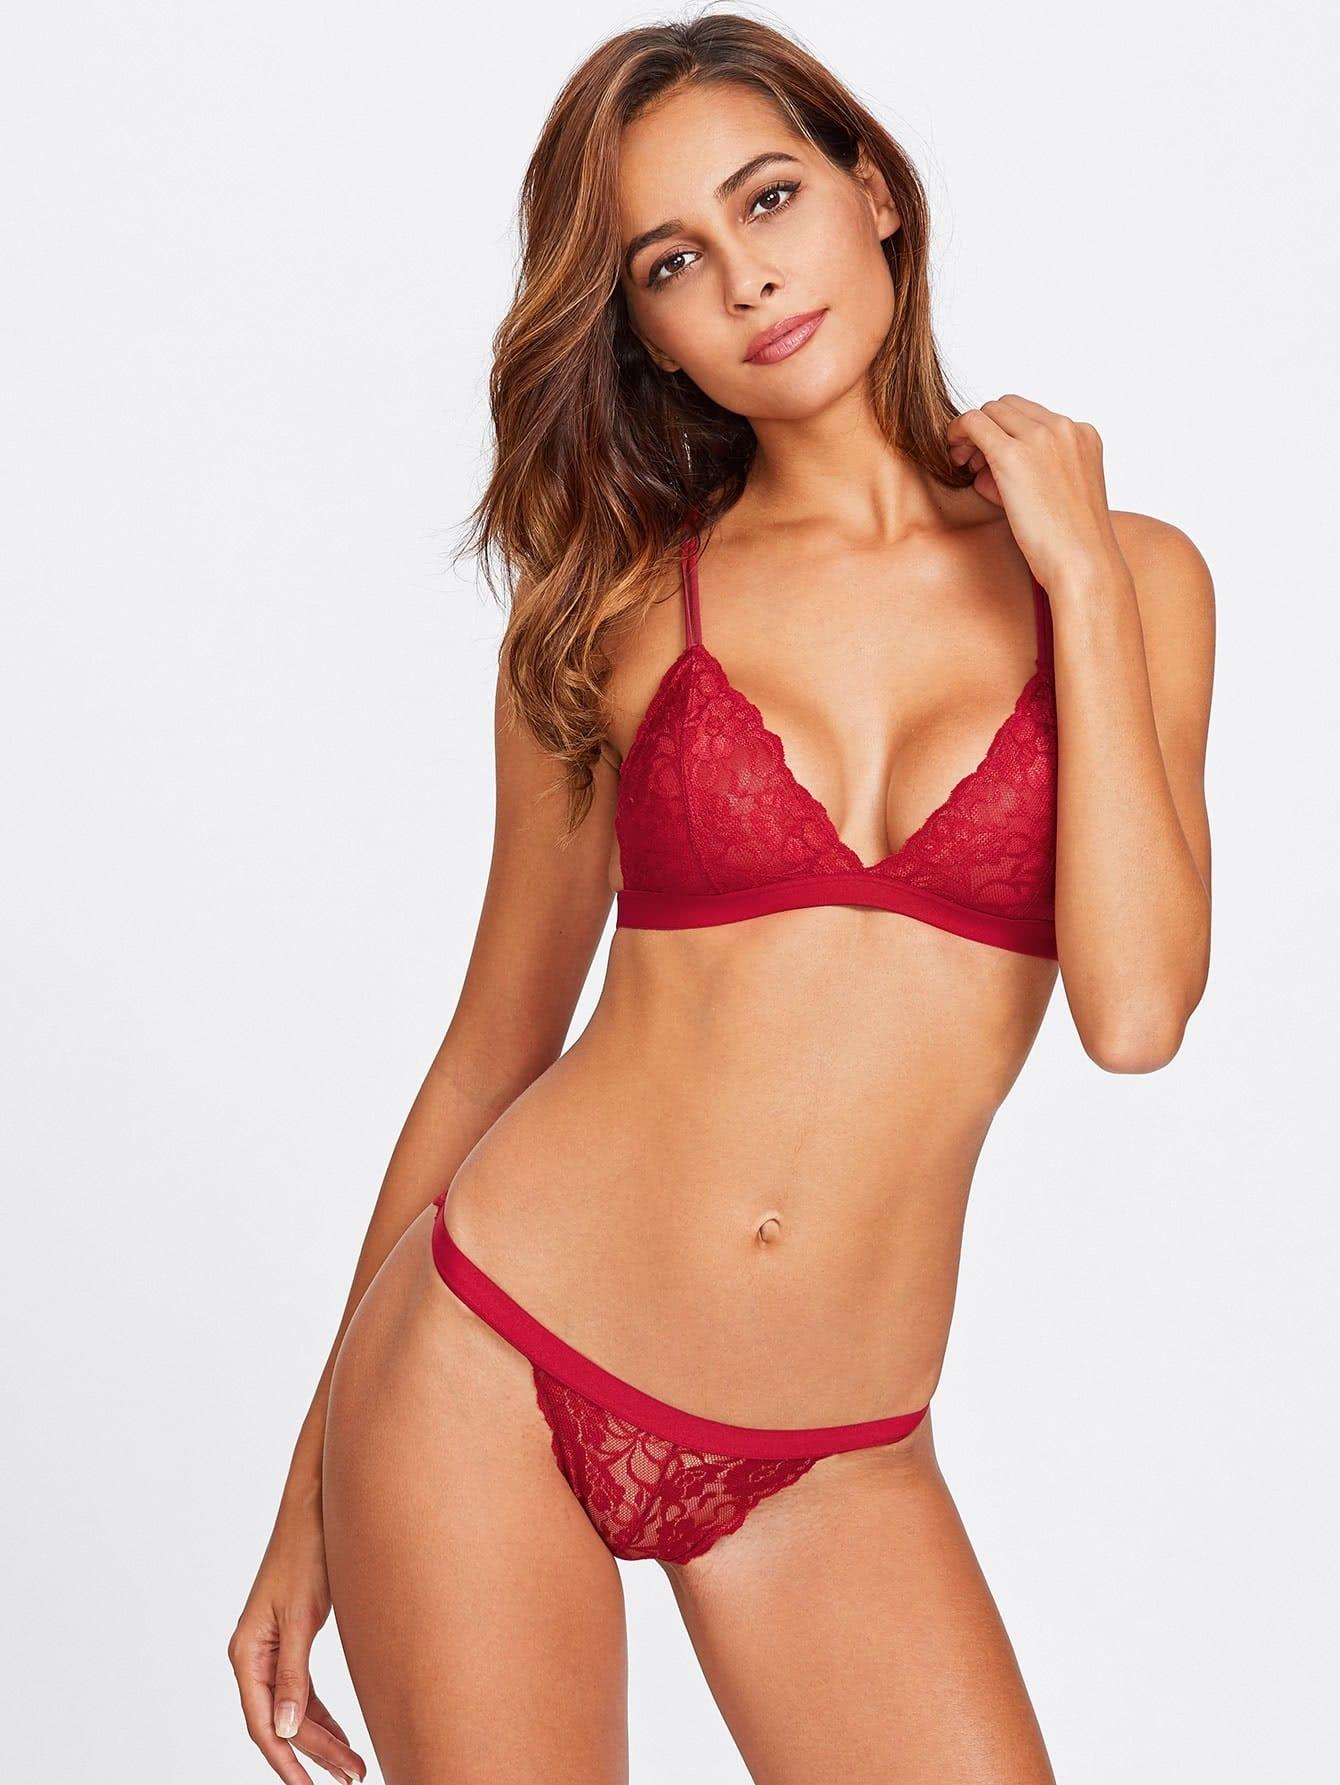 image Sexy plus size women